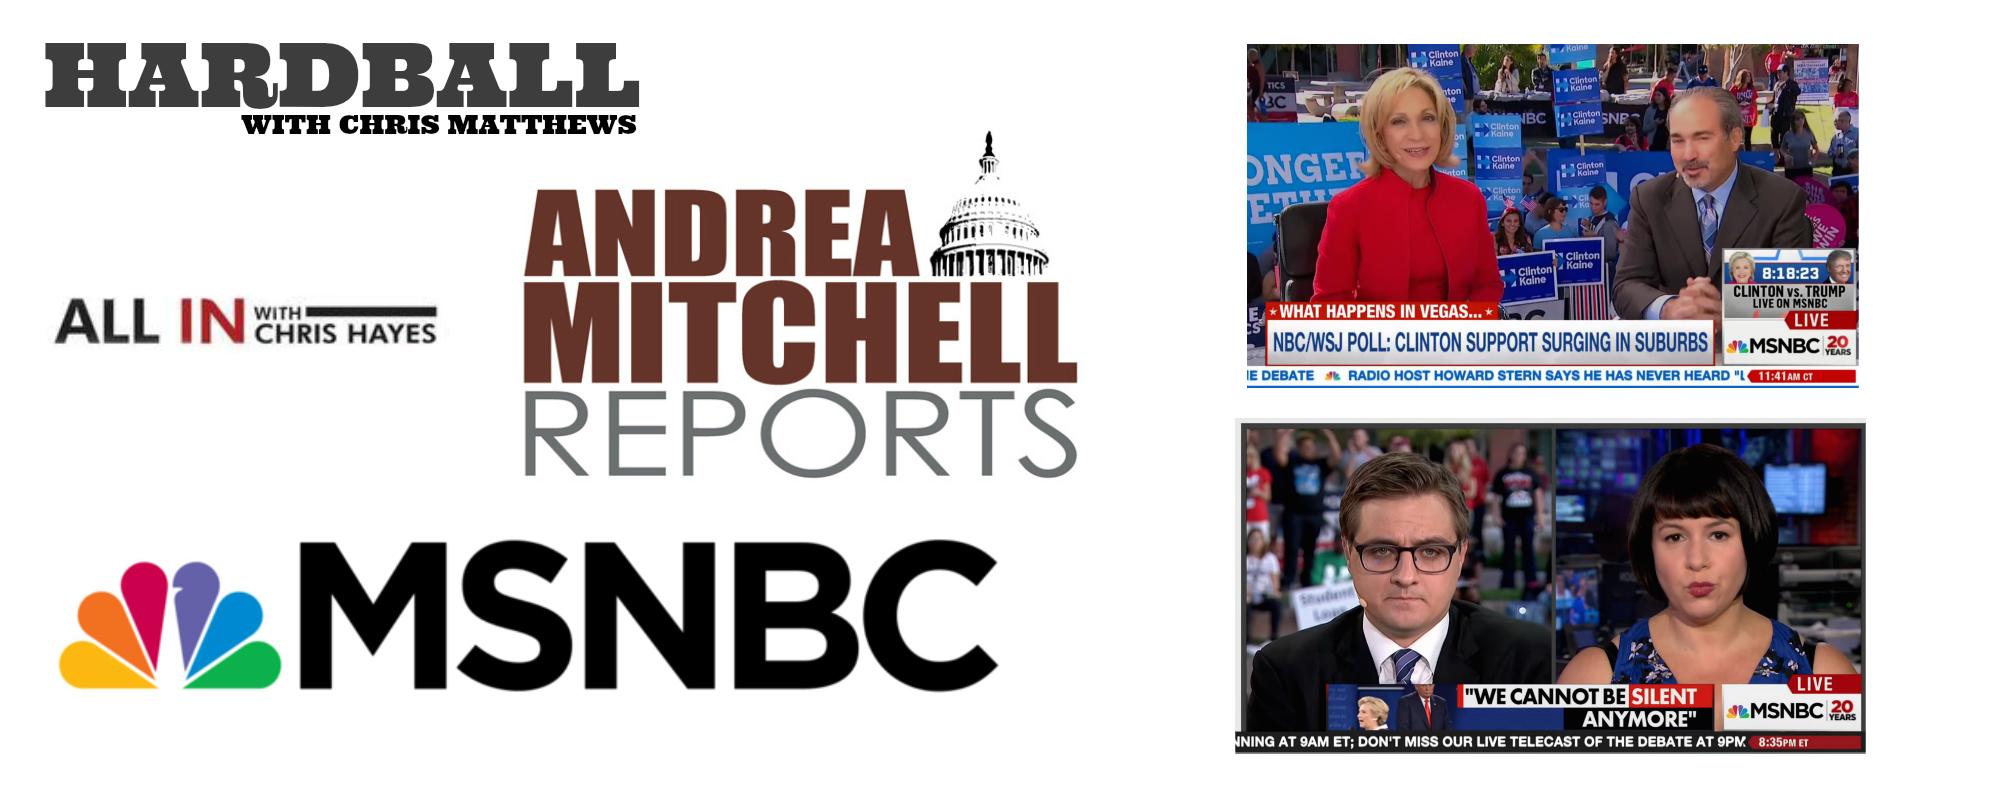 MSNBC Presidential Debate 2016